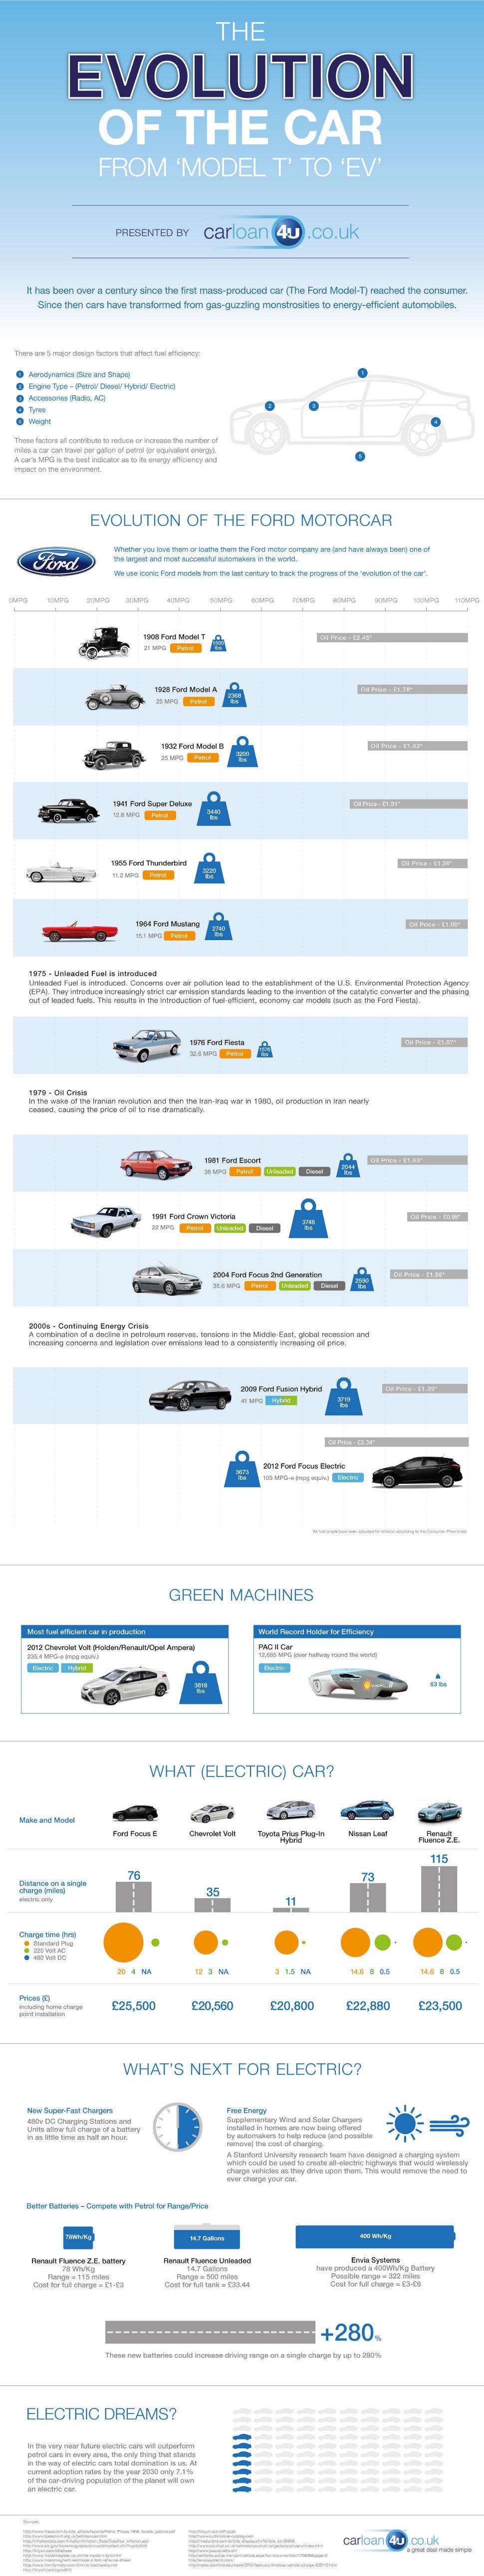 Entwicklung des Autos - From Model T to EV